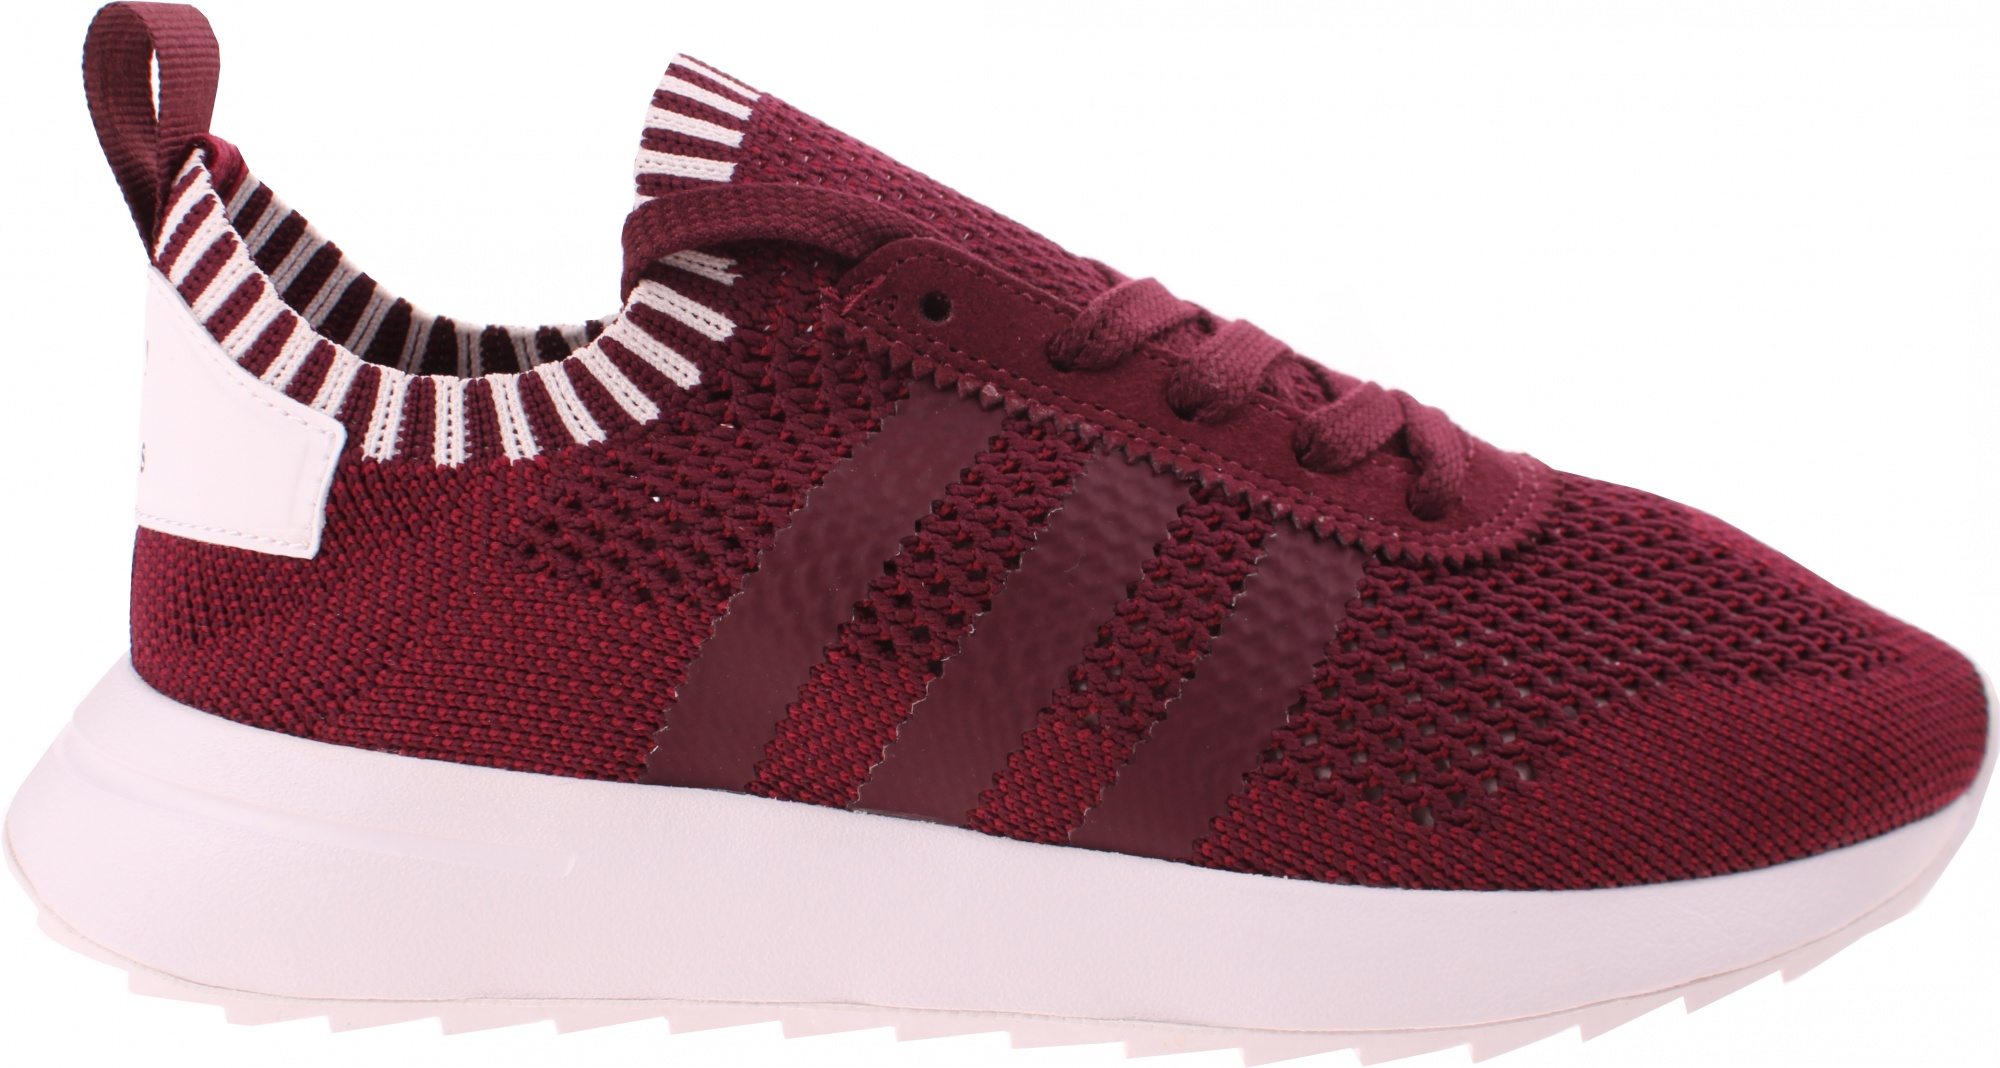 quality design e42fb c1eab adidas sneakers Flashback ladies red. Enlarge